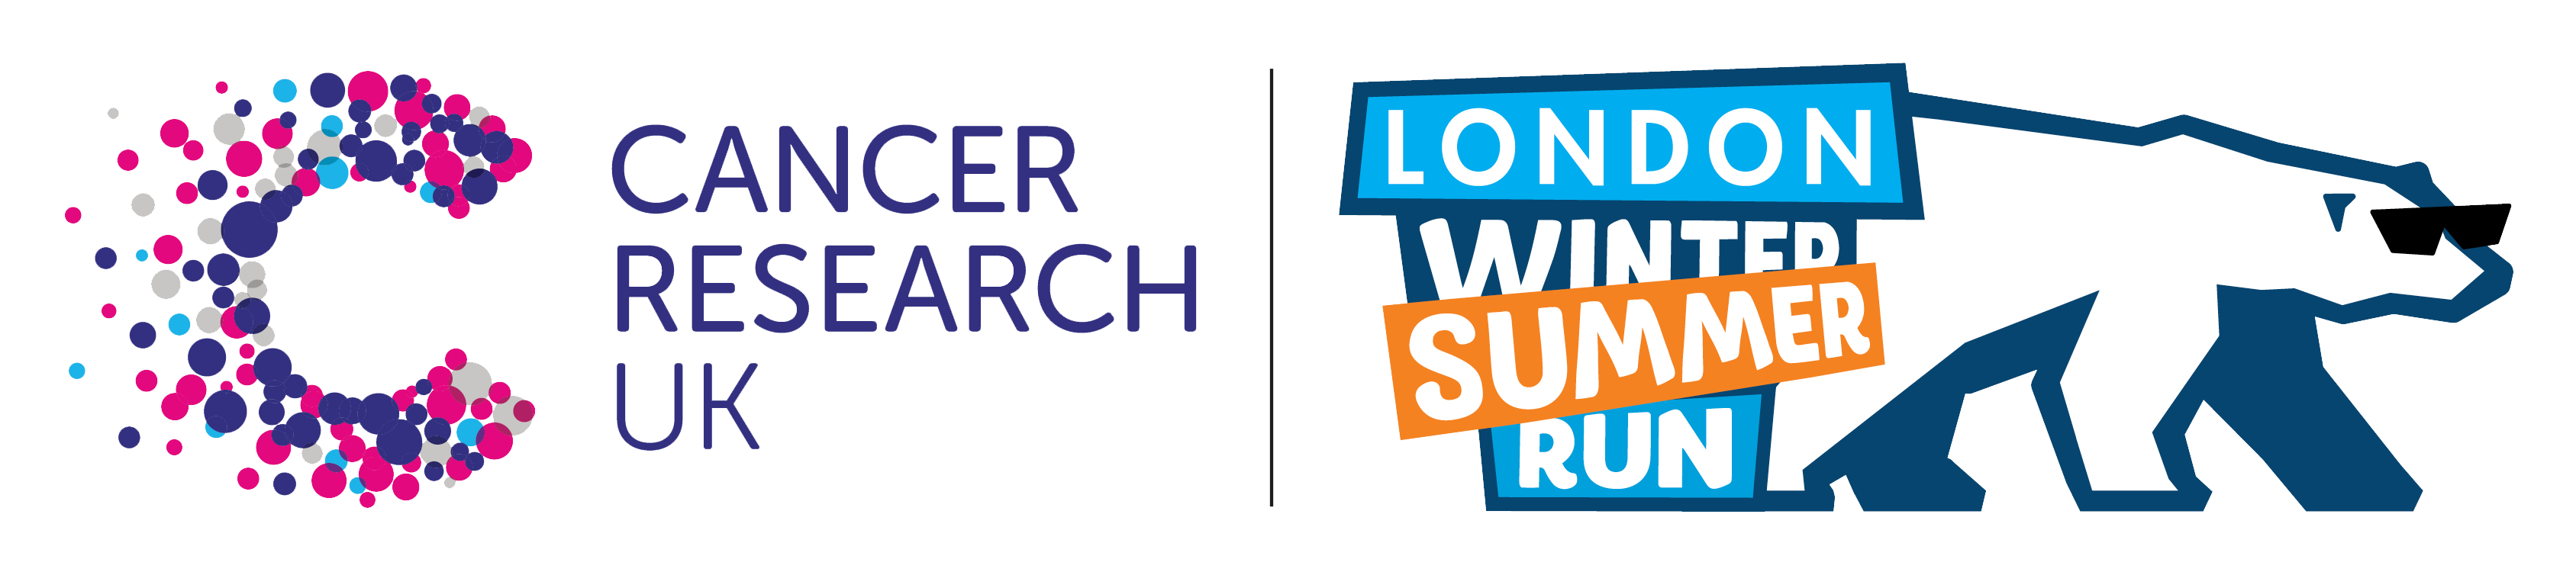 London Summer Run Official Photos 2021